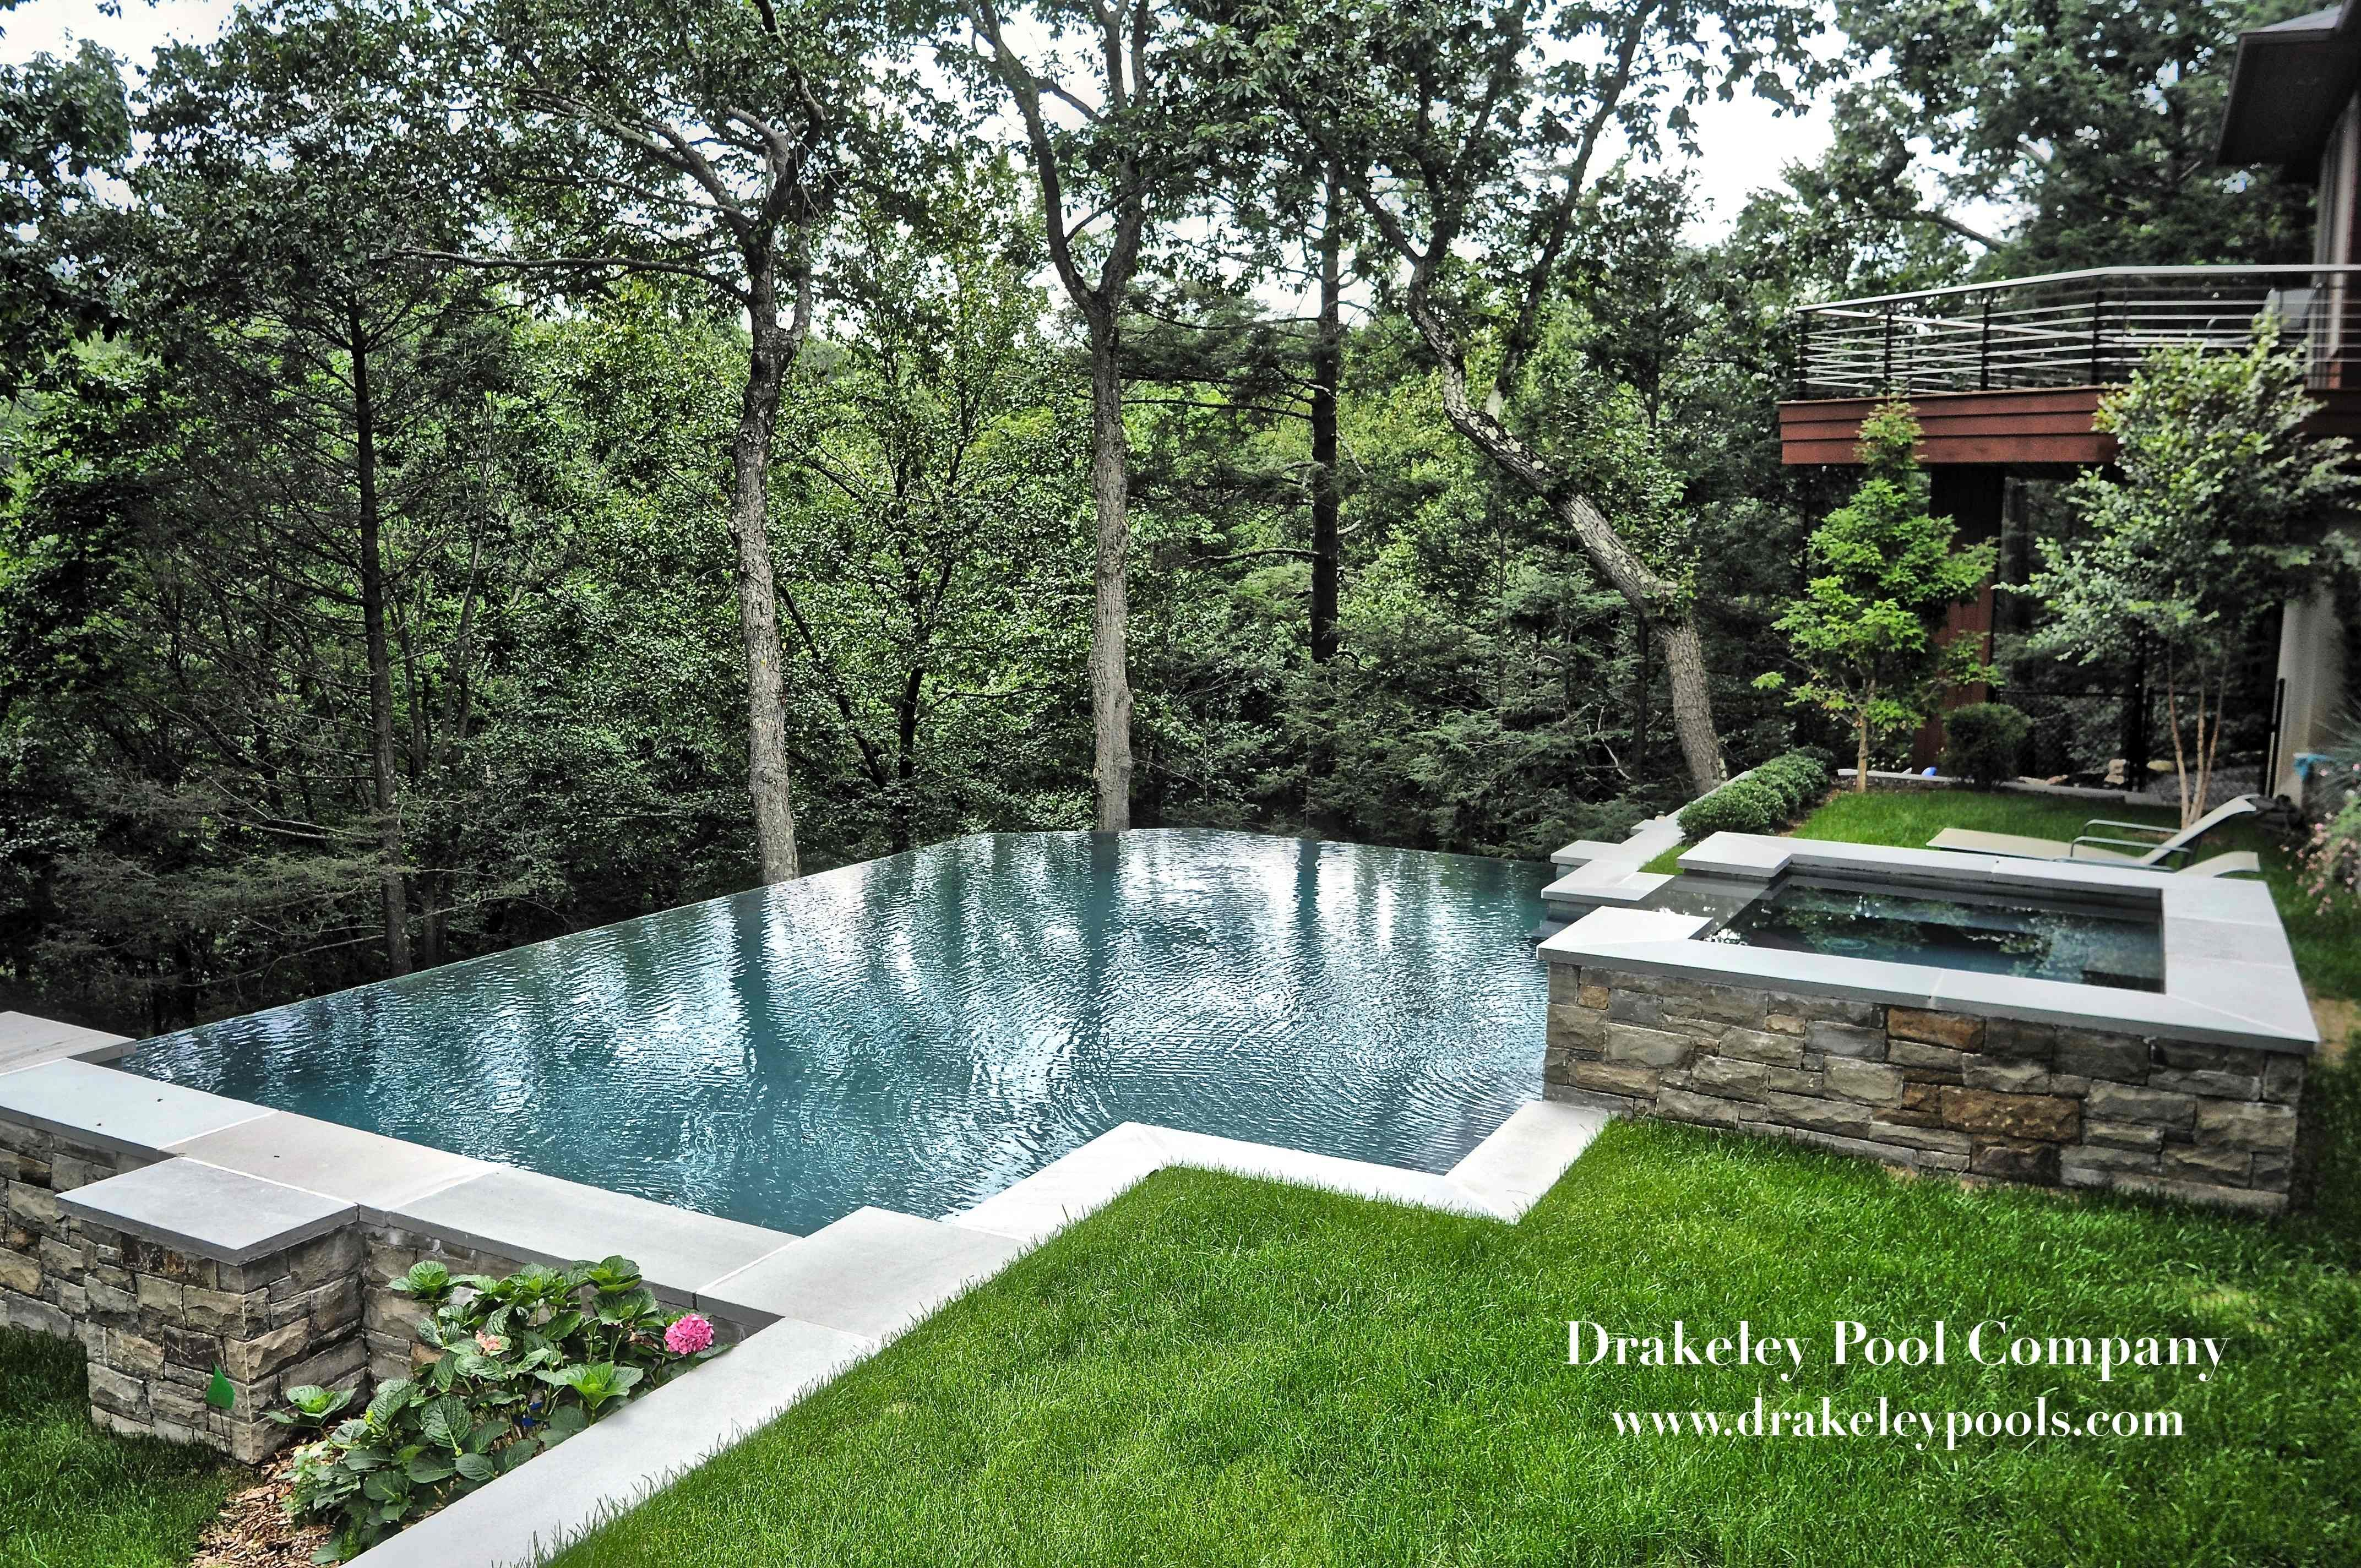 drakeley pool company luxury cliffside swimming pool u0026 spa www